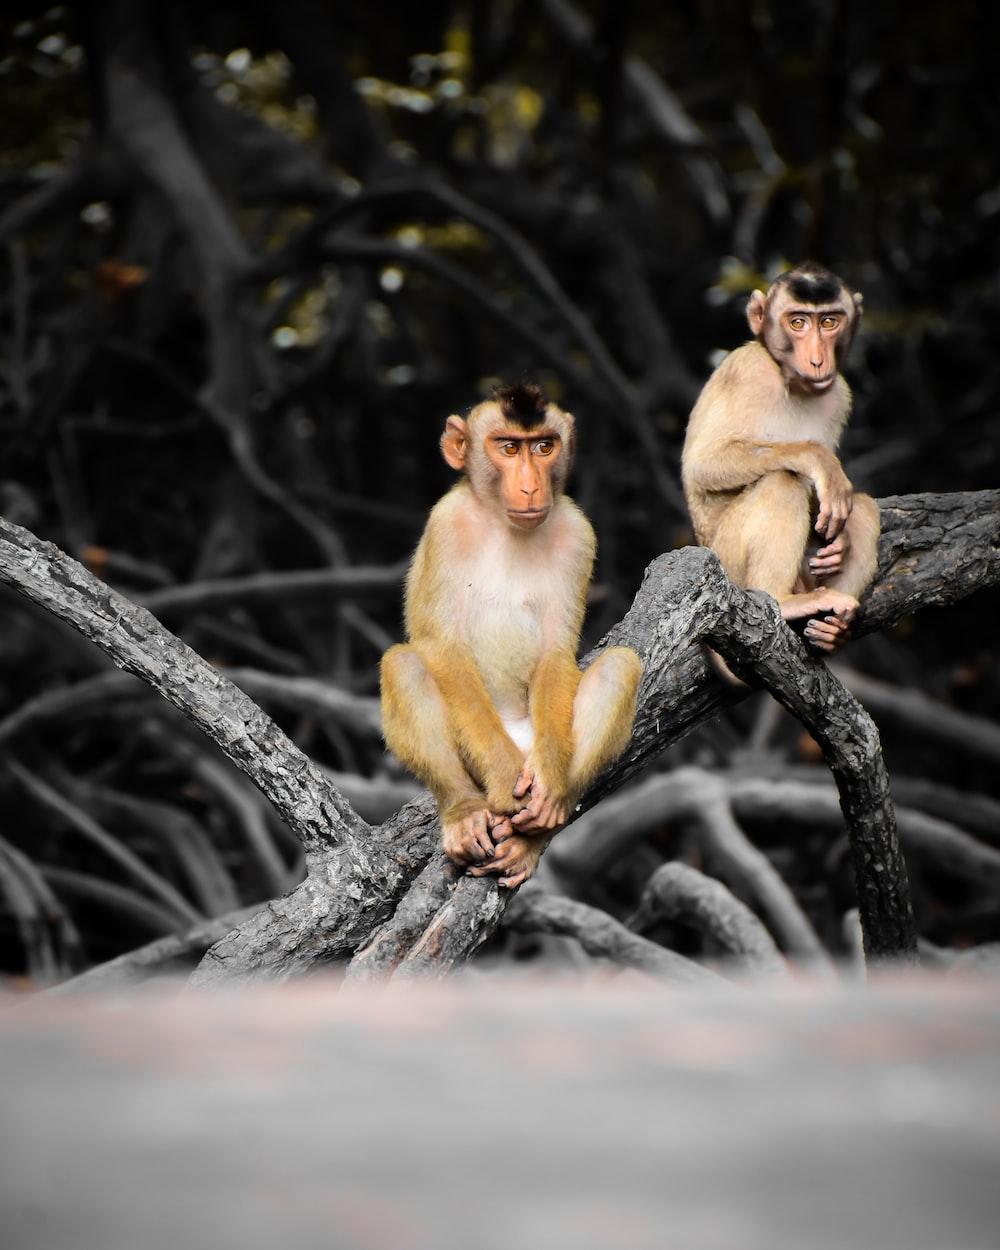 brown monkey on black tree branch